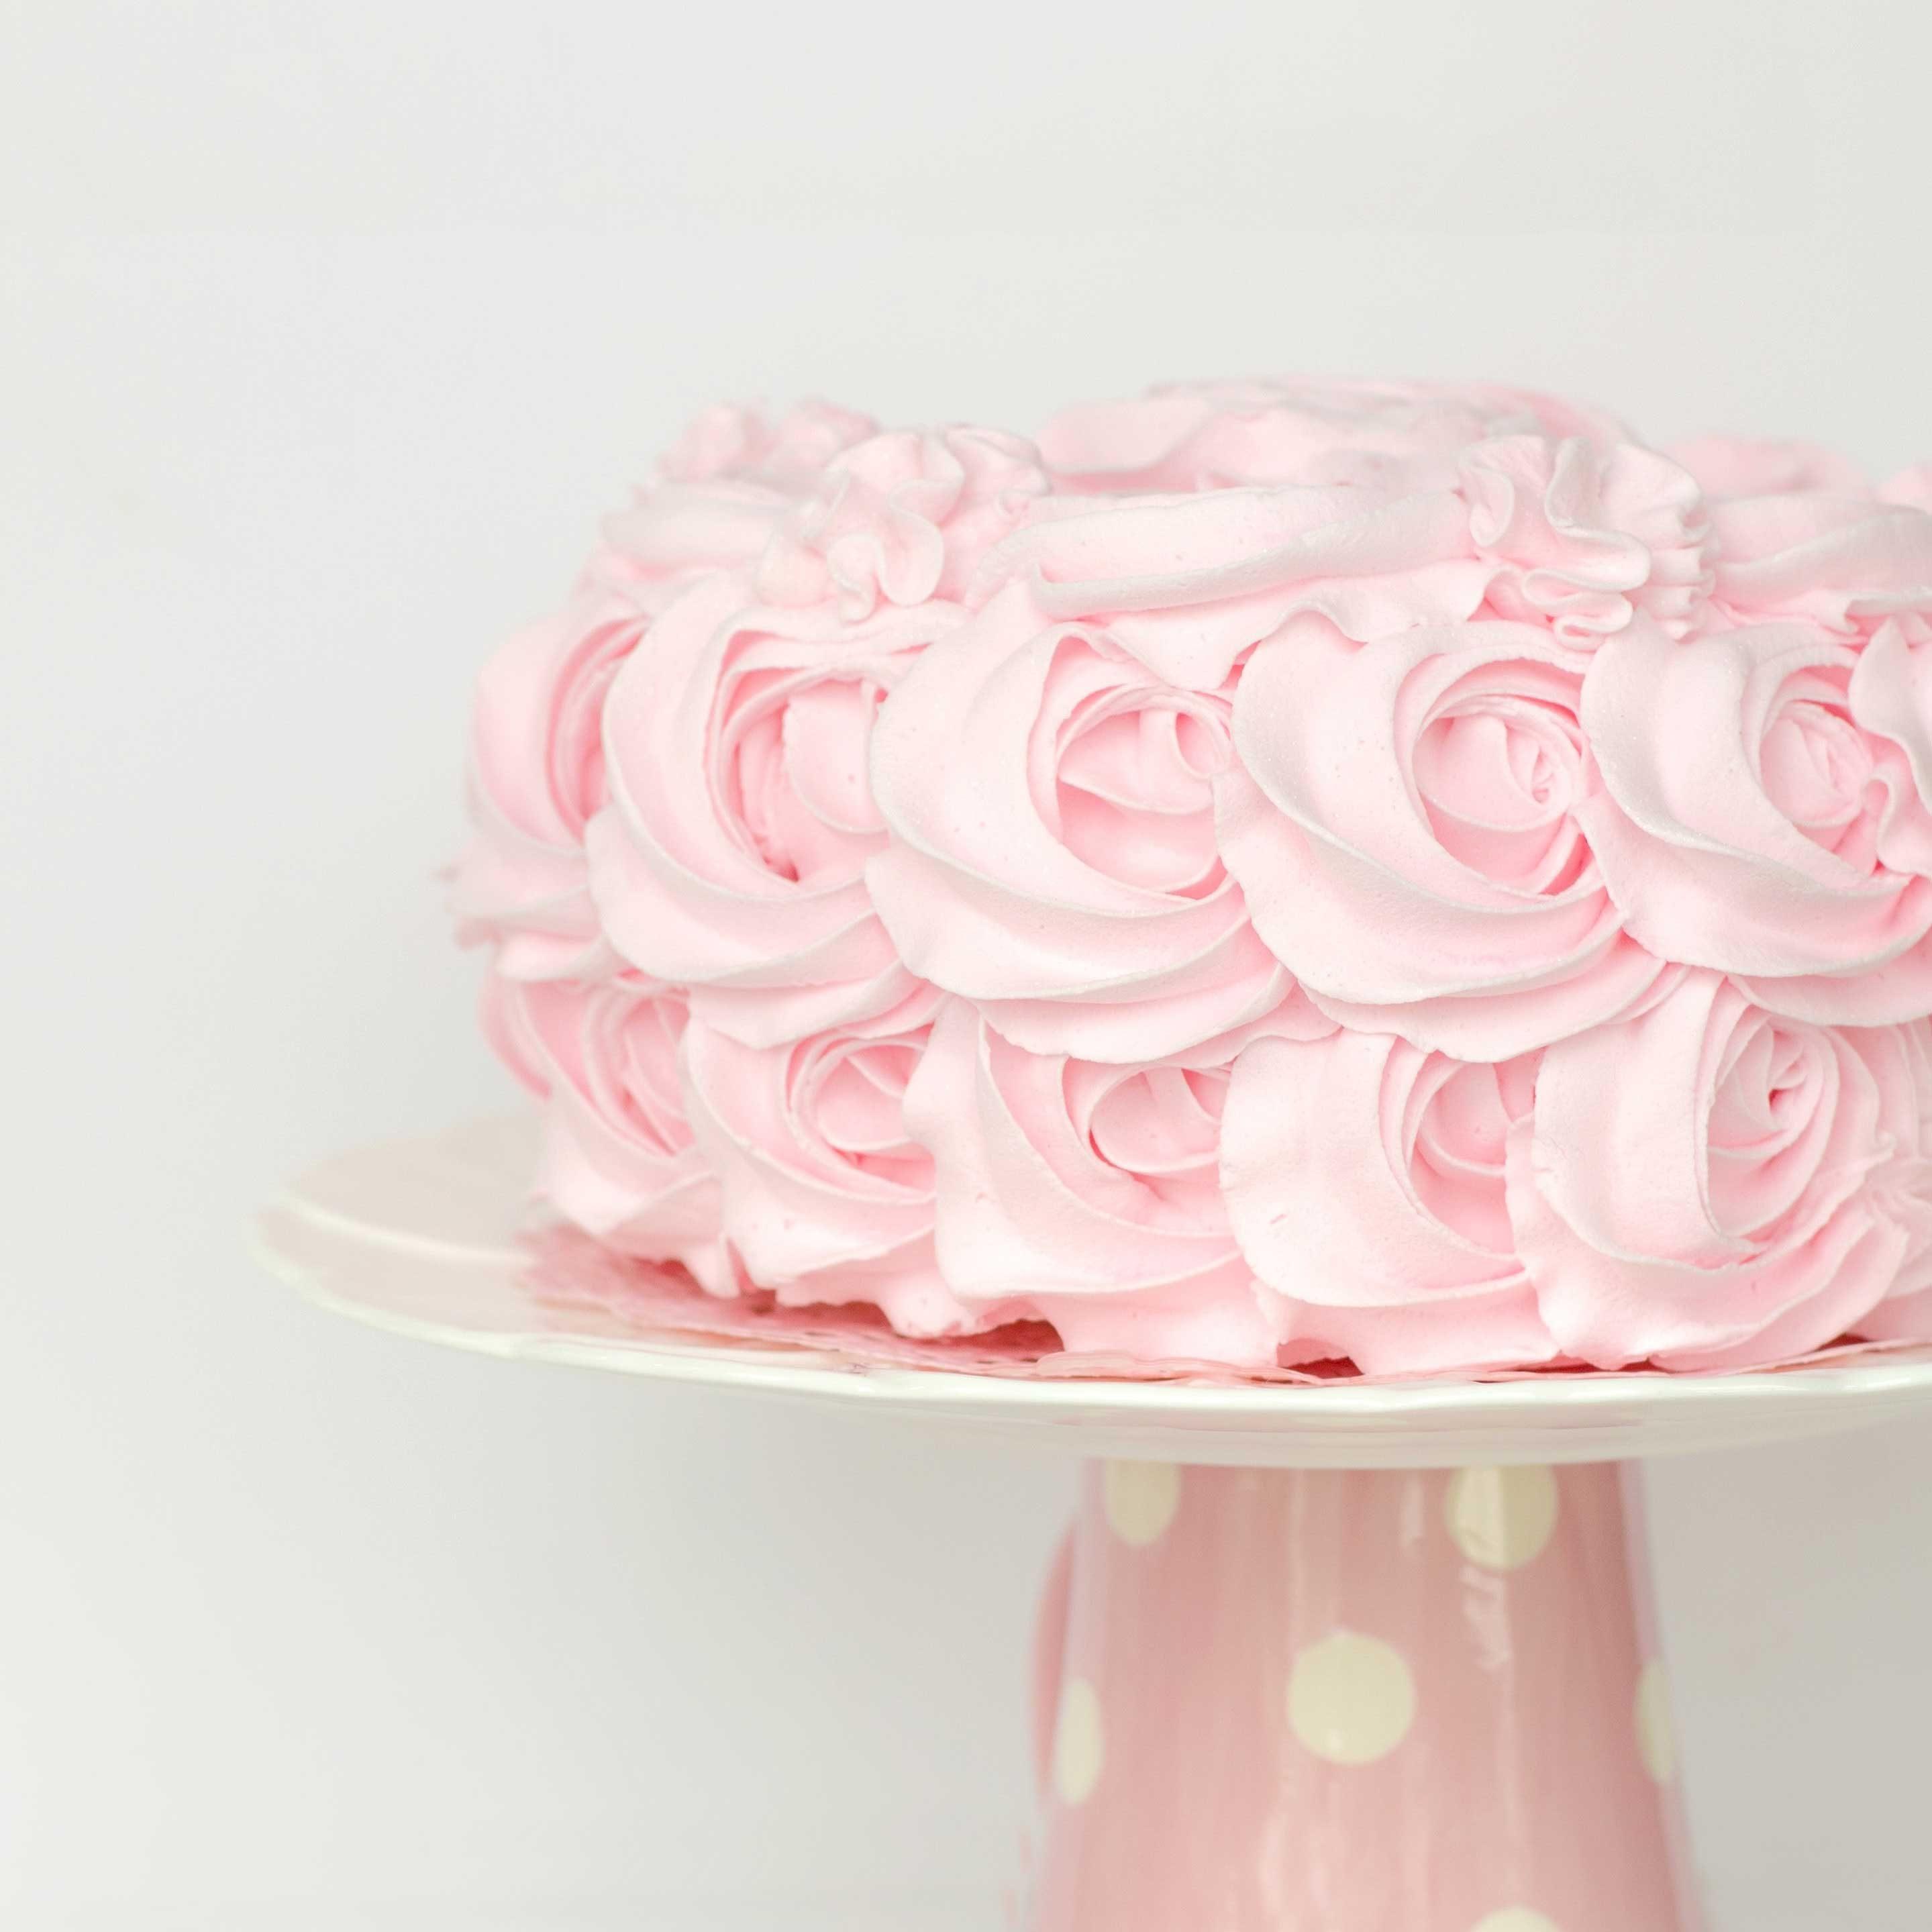 Pasticceria-torte-compleanno